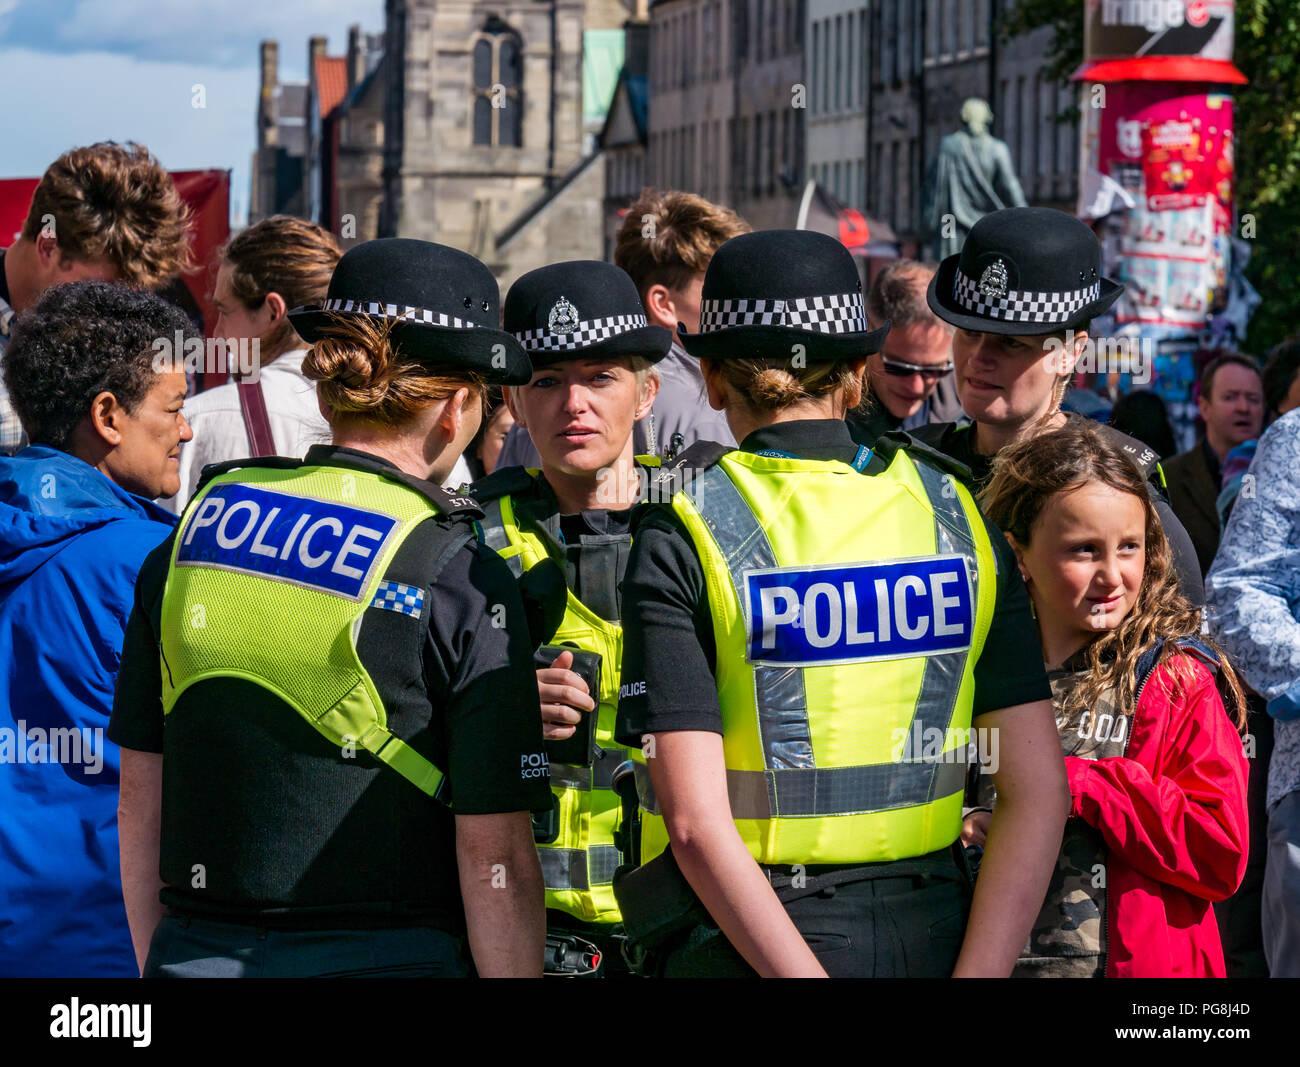 edinburgh-fringe-festival-edinburgh-scot